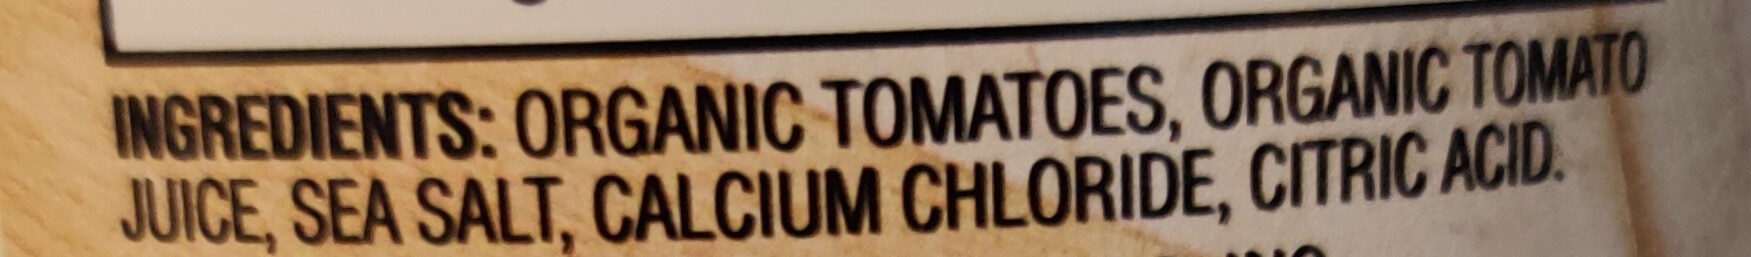 Organic Petite Diced Tomatoes - Ingredients